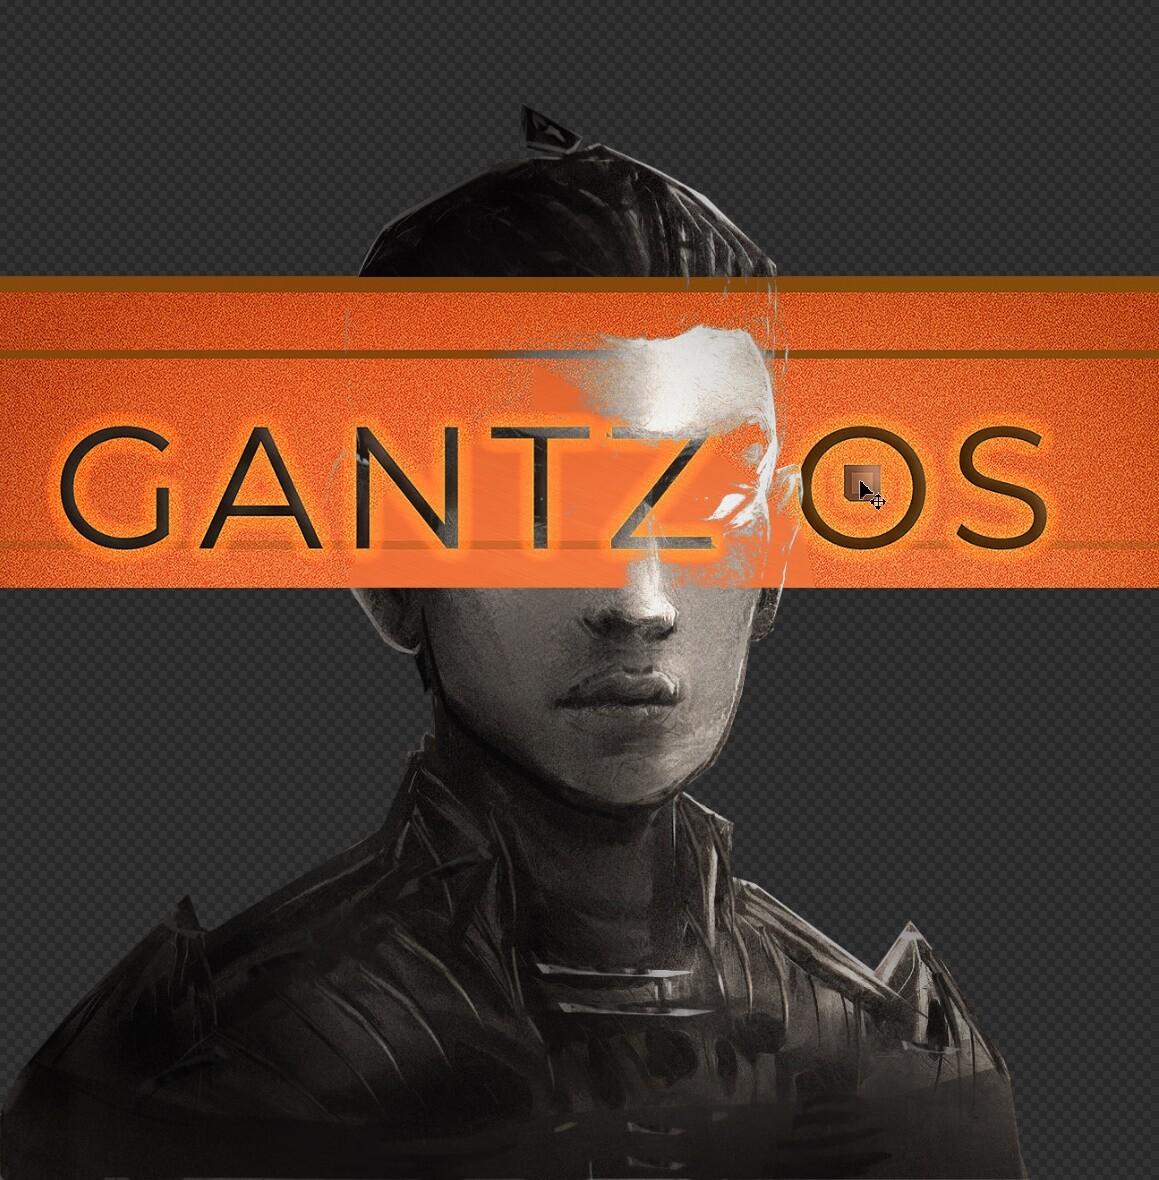 GANTZ OS